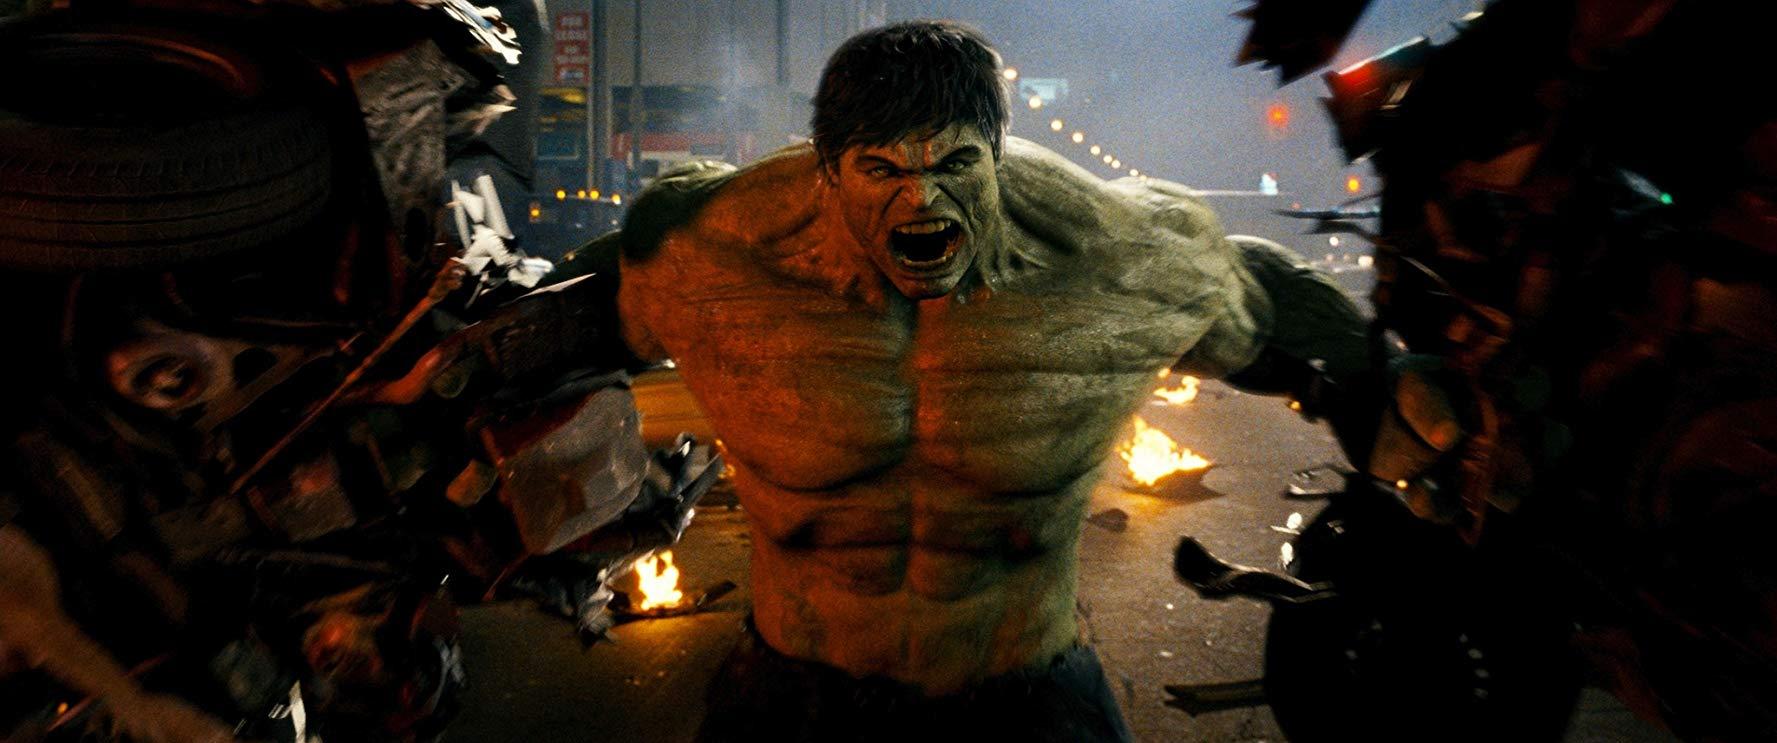 22. The Incredible Hulk (2008) - Ocena użytkowników: 6,7